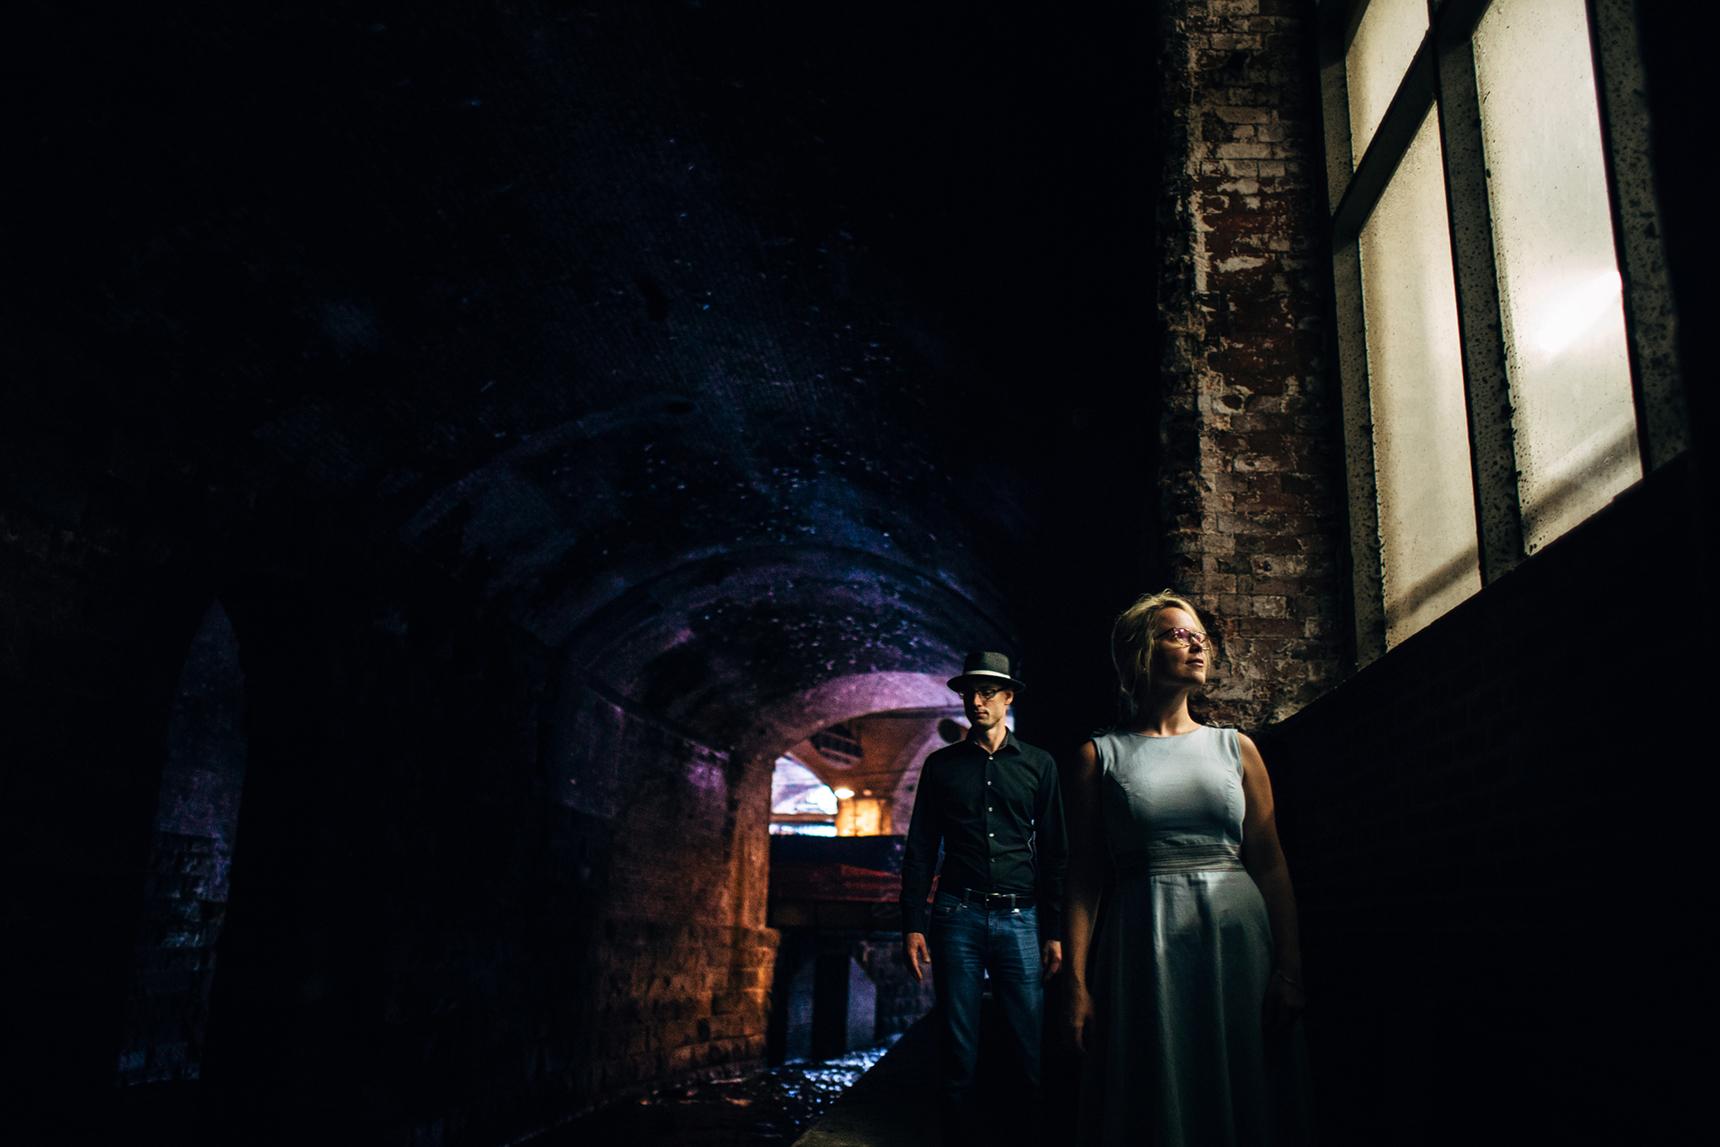 Leeds dark arches photos